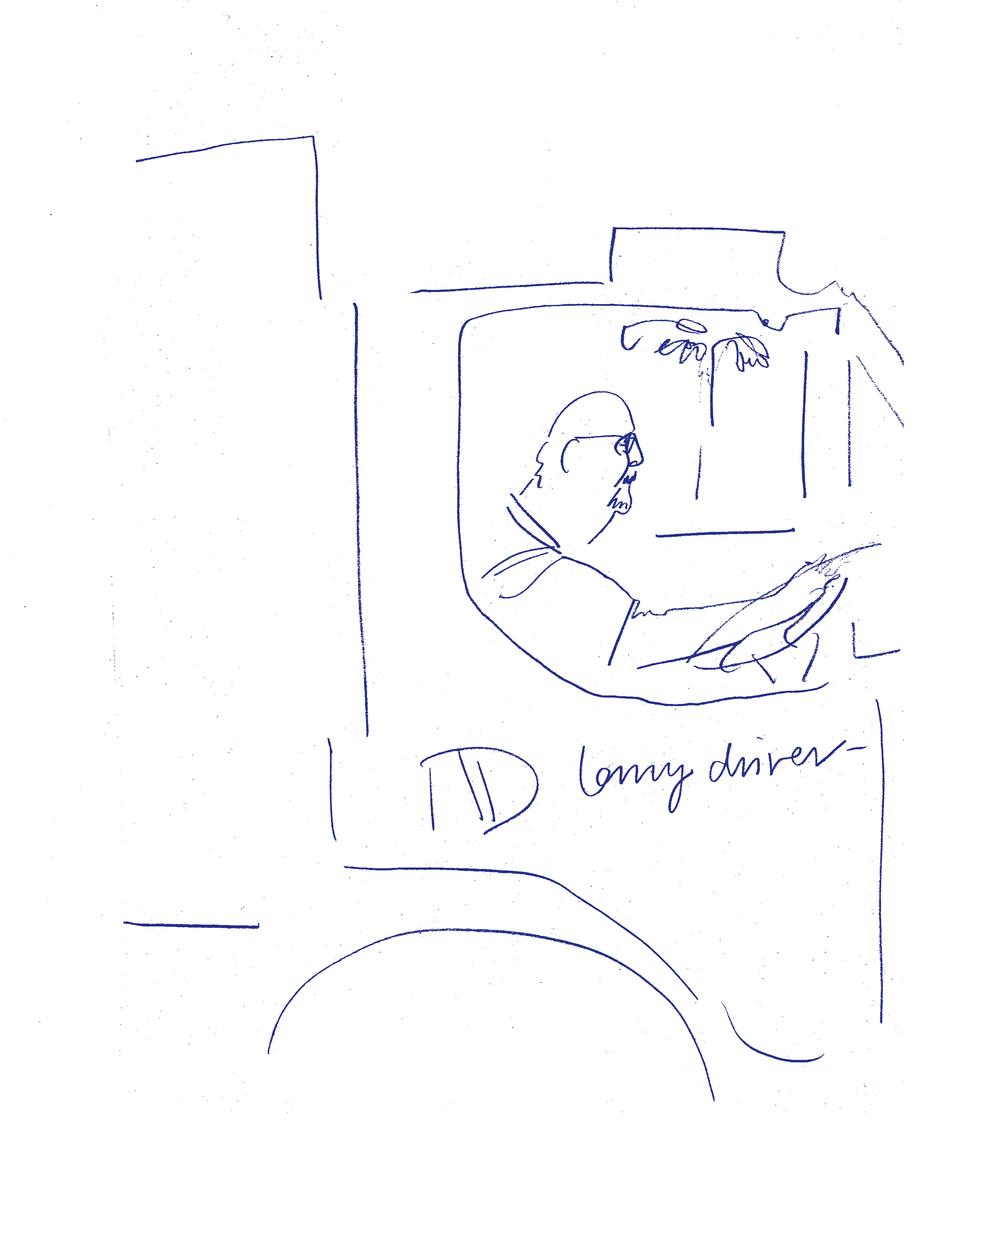 lorry-driver-aurelia-lange